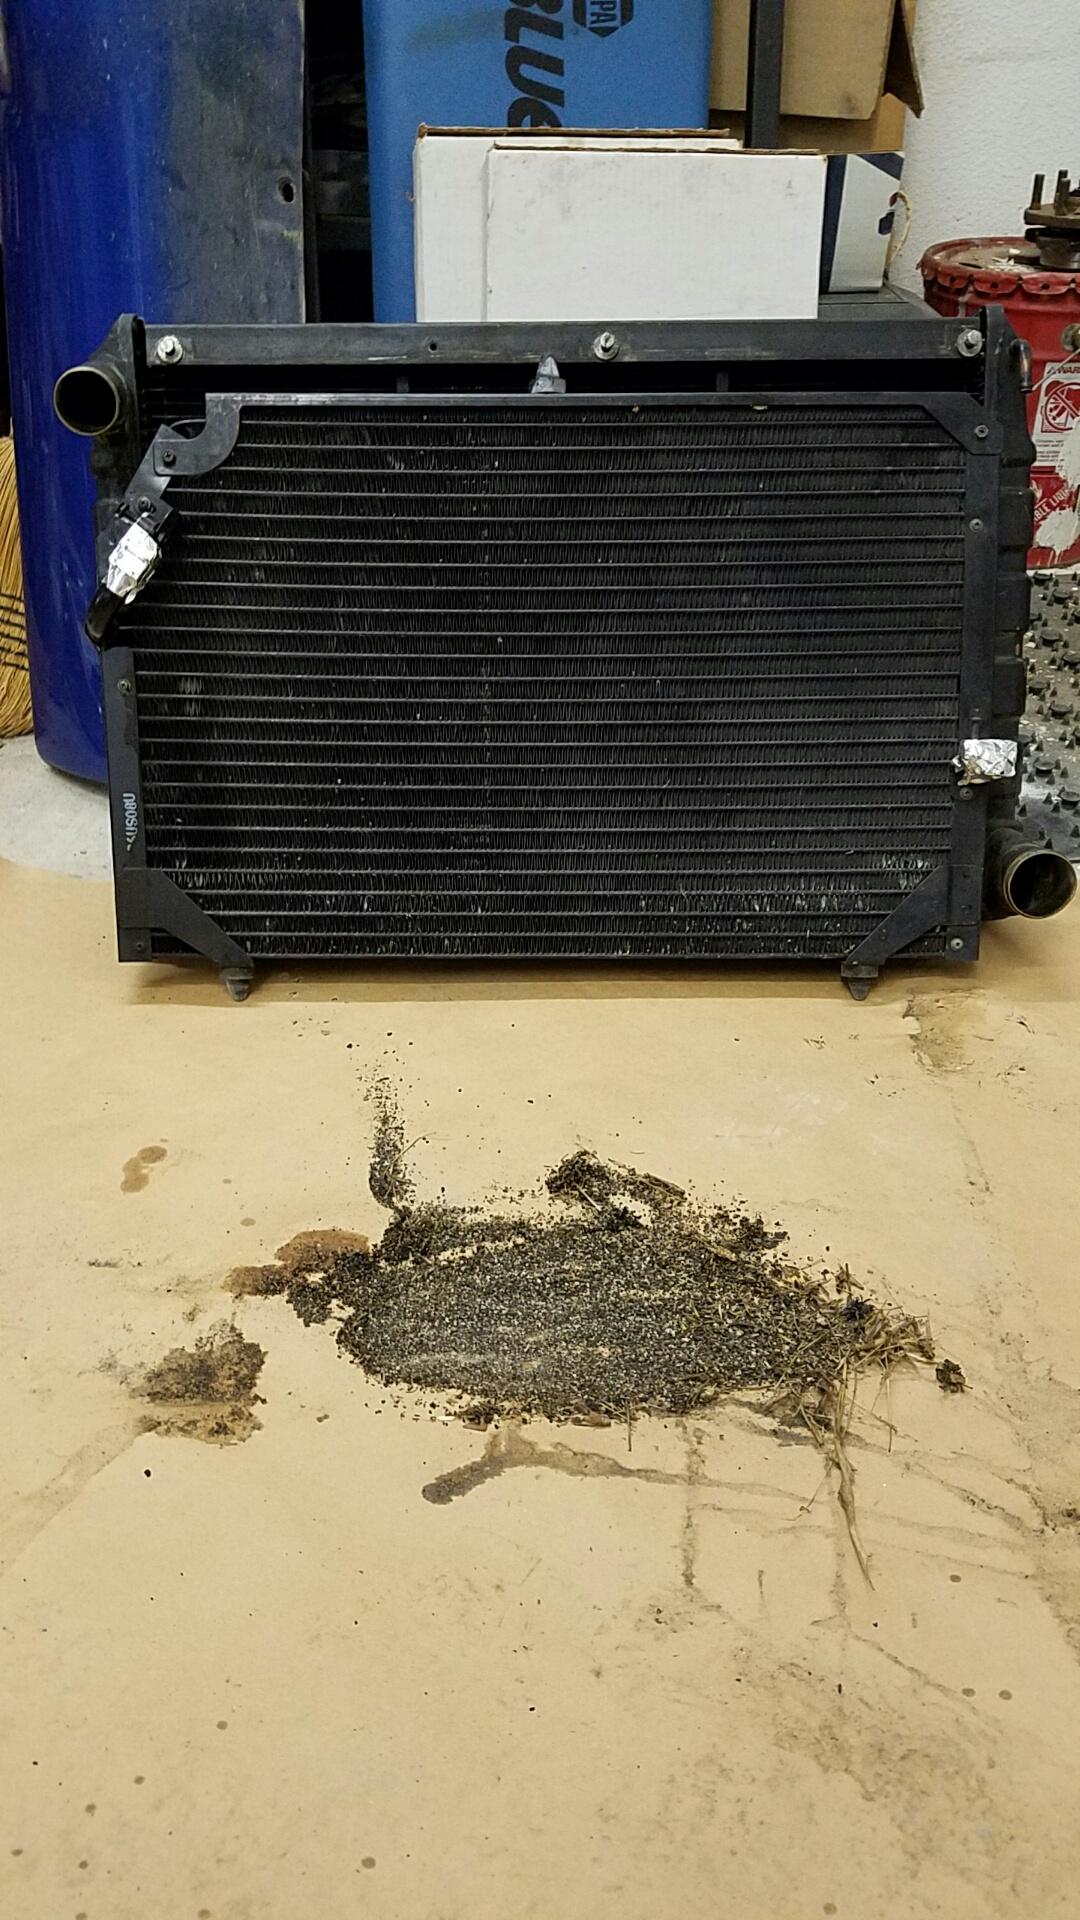 Click image for larger version  Name:radiator trash.jpg Views:98 Size:717.9 KB ID:146753